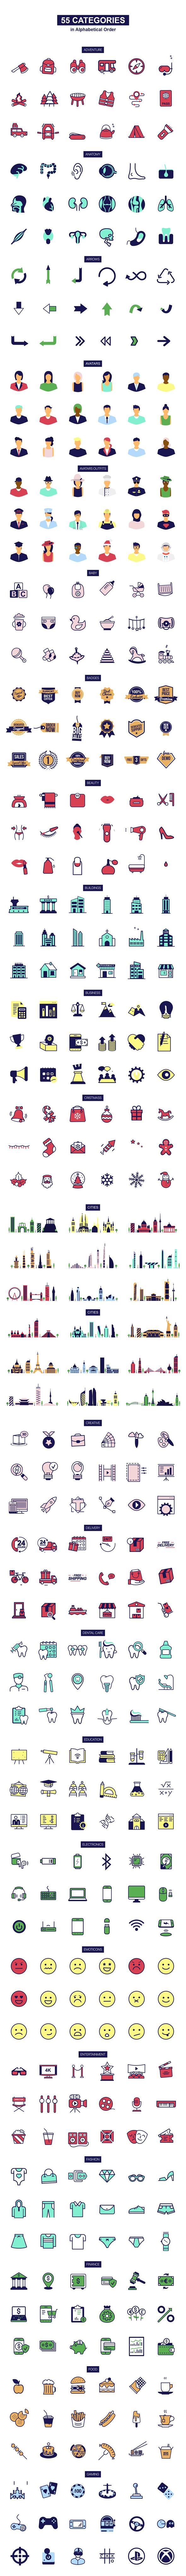 1000组线条ICON图标扁平化MG动画AE视频模板素材 PremiumBuilder Animated Icons插图10